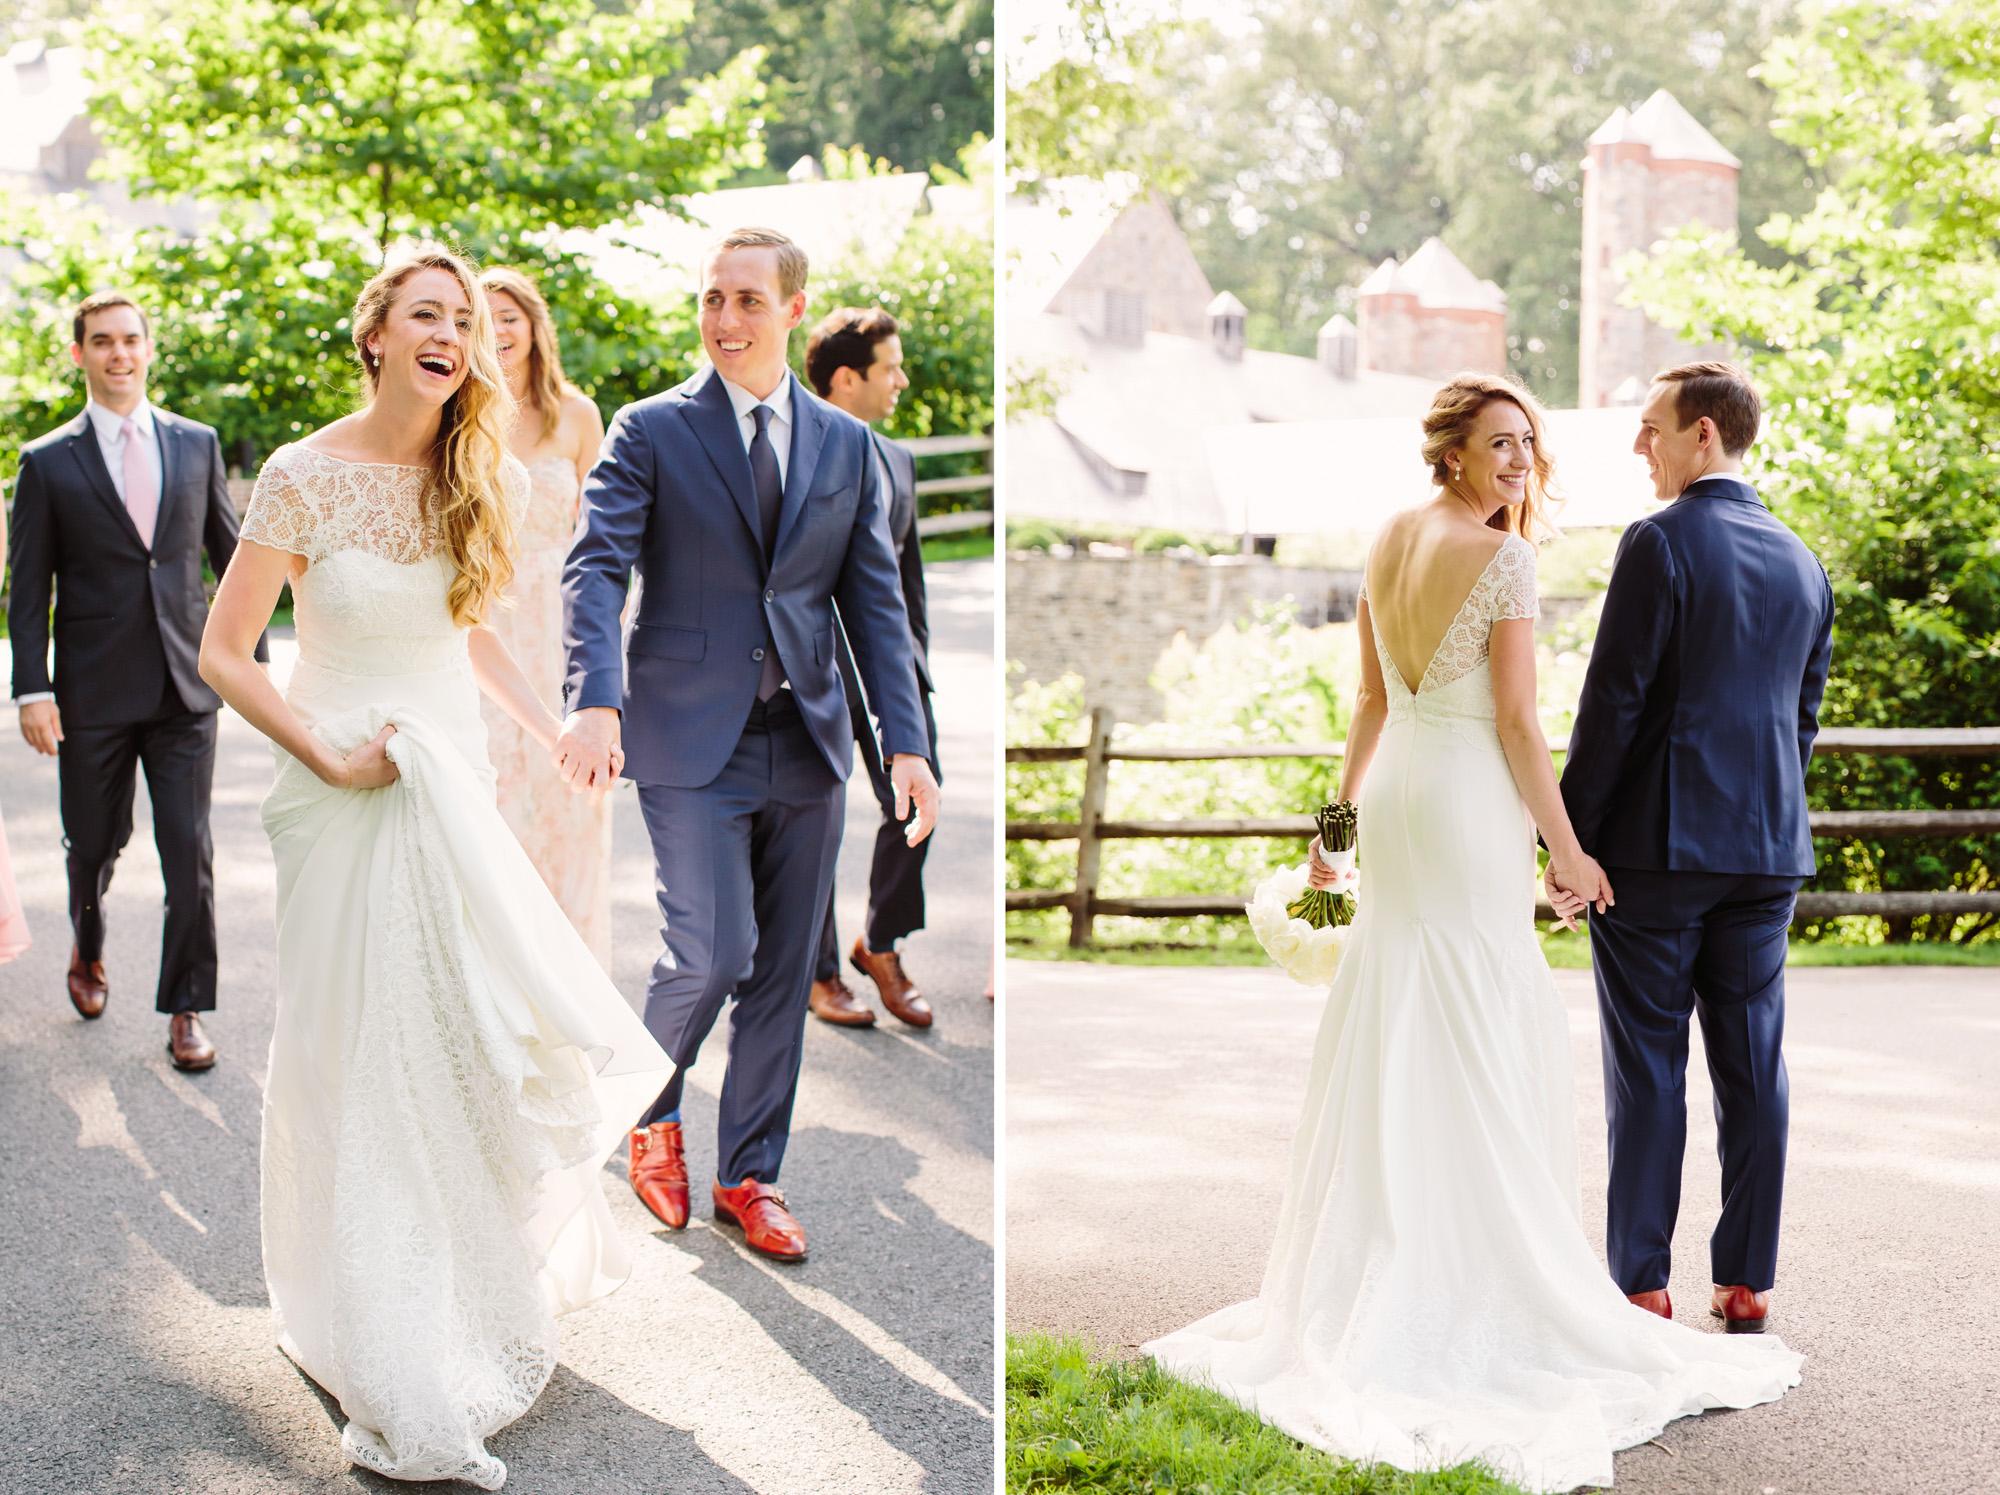 30_Jessica_Ted_Blue_Hill_Stone_Barns_Wedding_Pocantico_NY_Tanya_Salazar_Photography.jpg